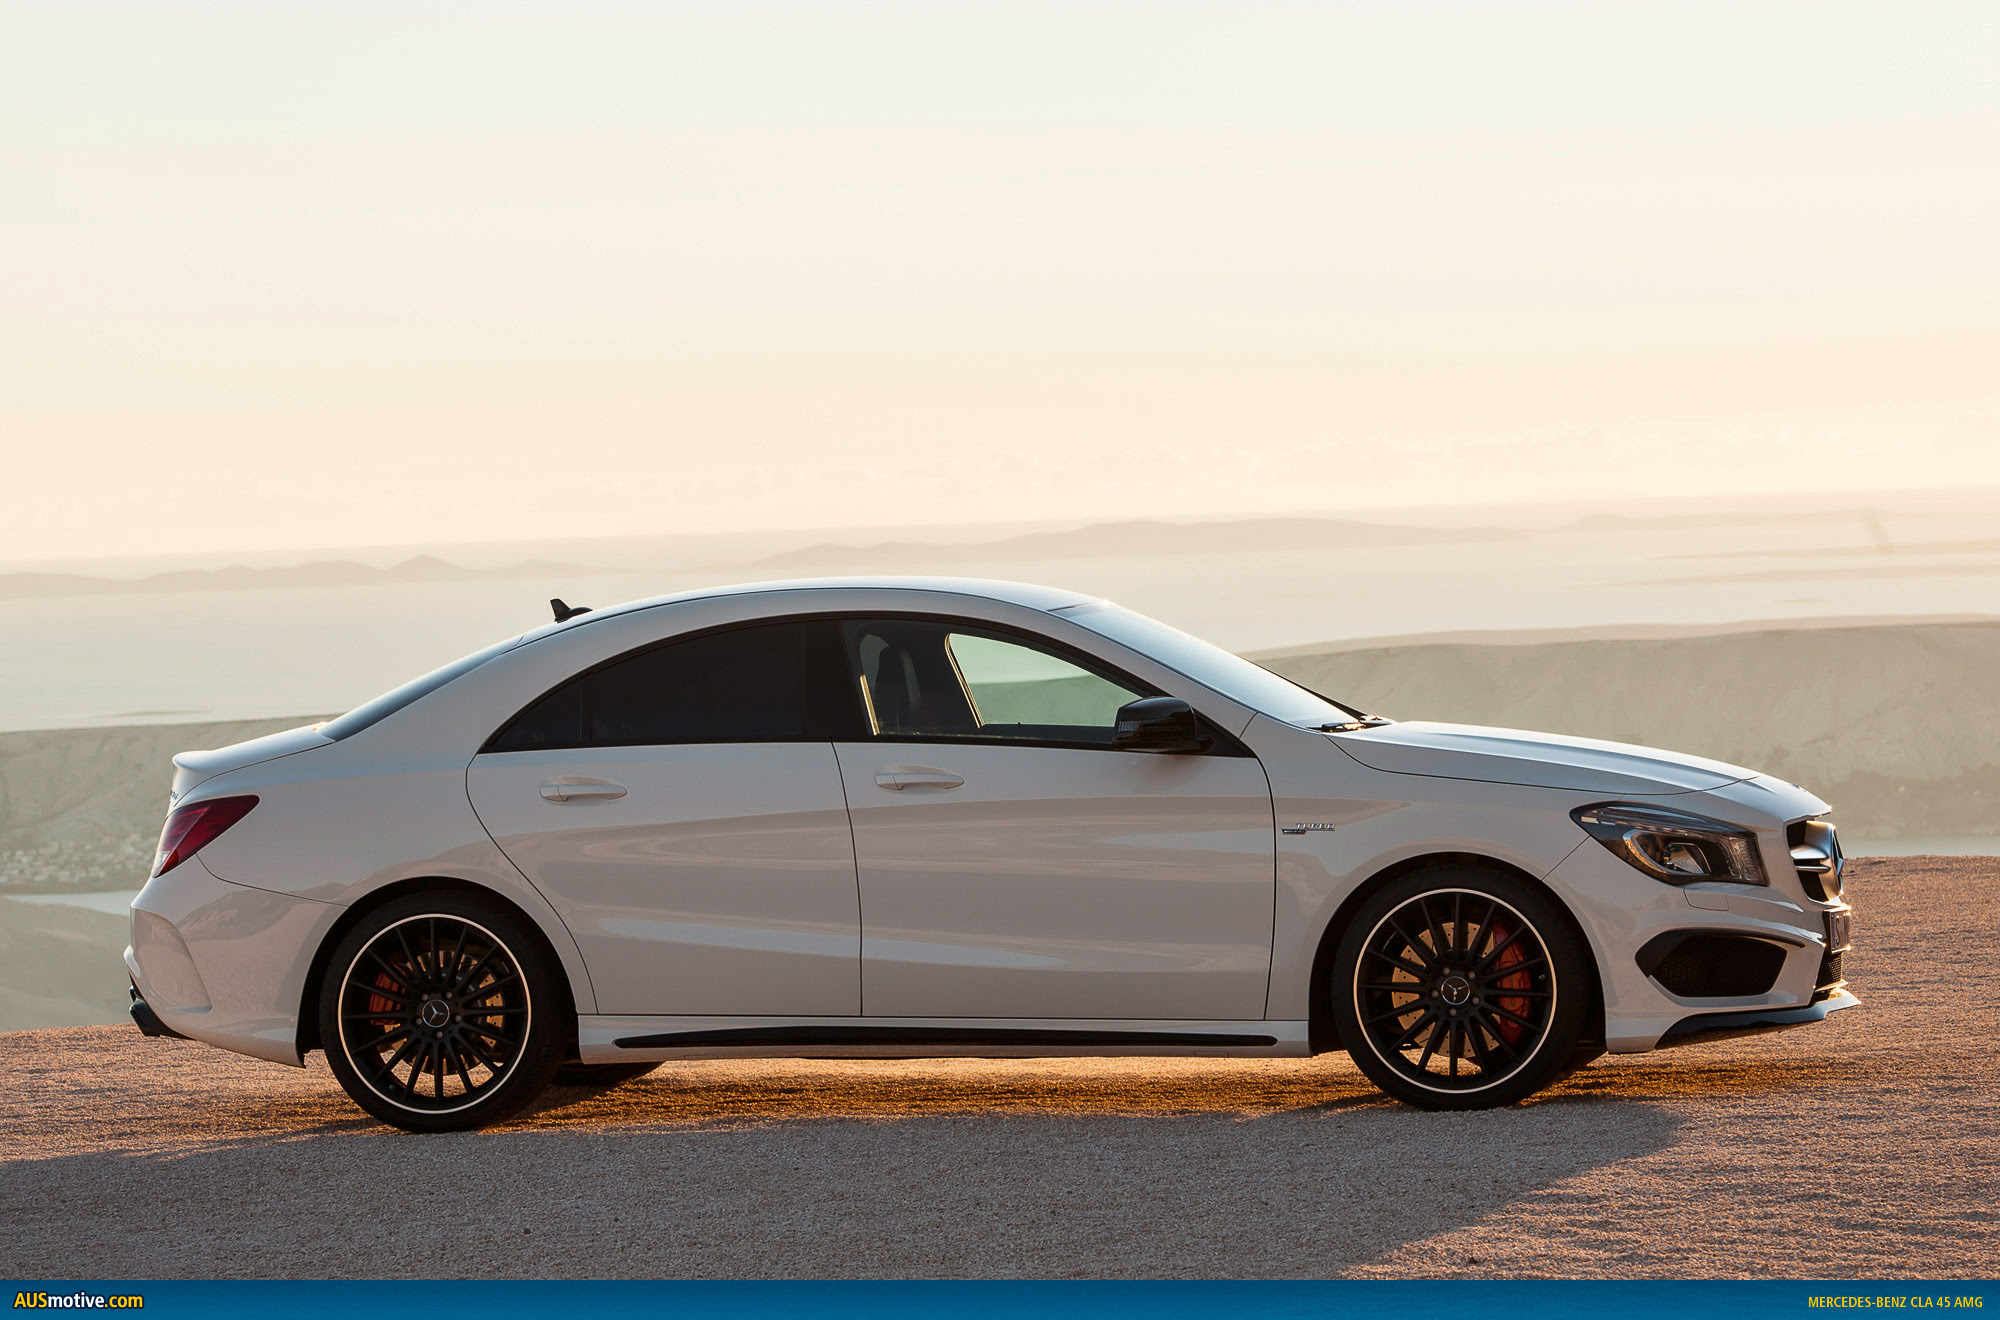 AUSmotive.com » New York 2013: Mercedes-Benz CLA 45 AMG